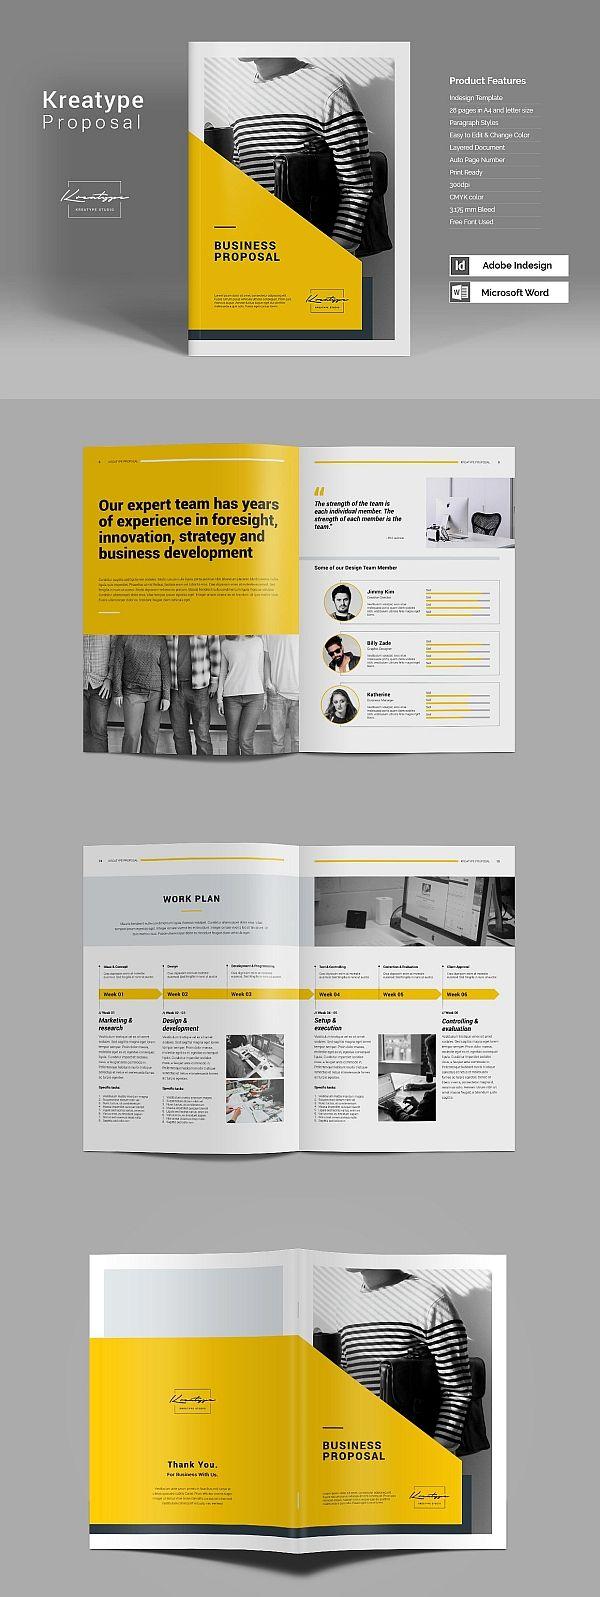 kreatype proposal process books pinterest brochure design